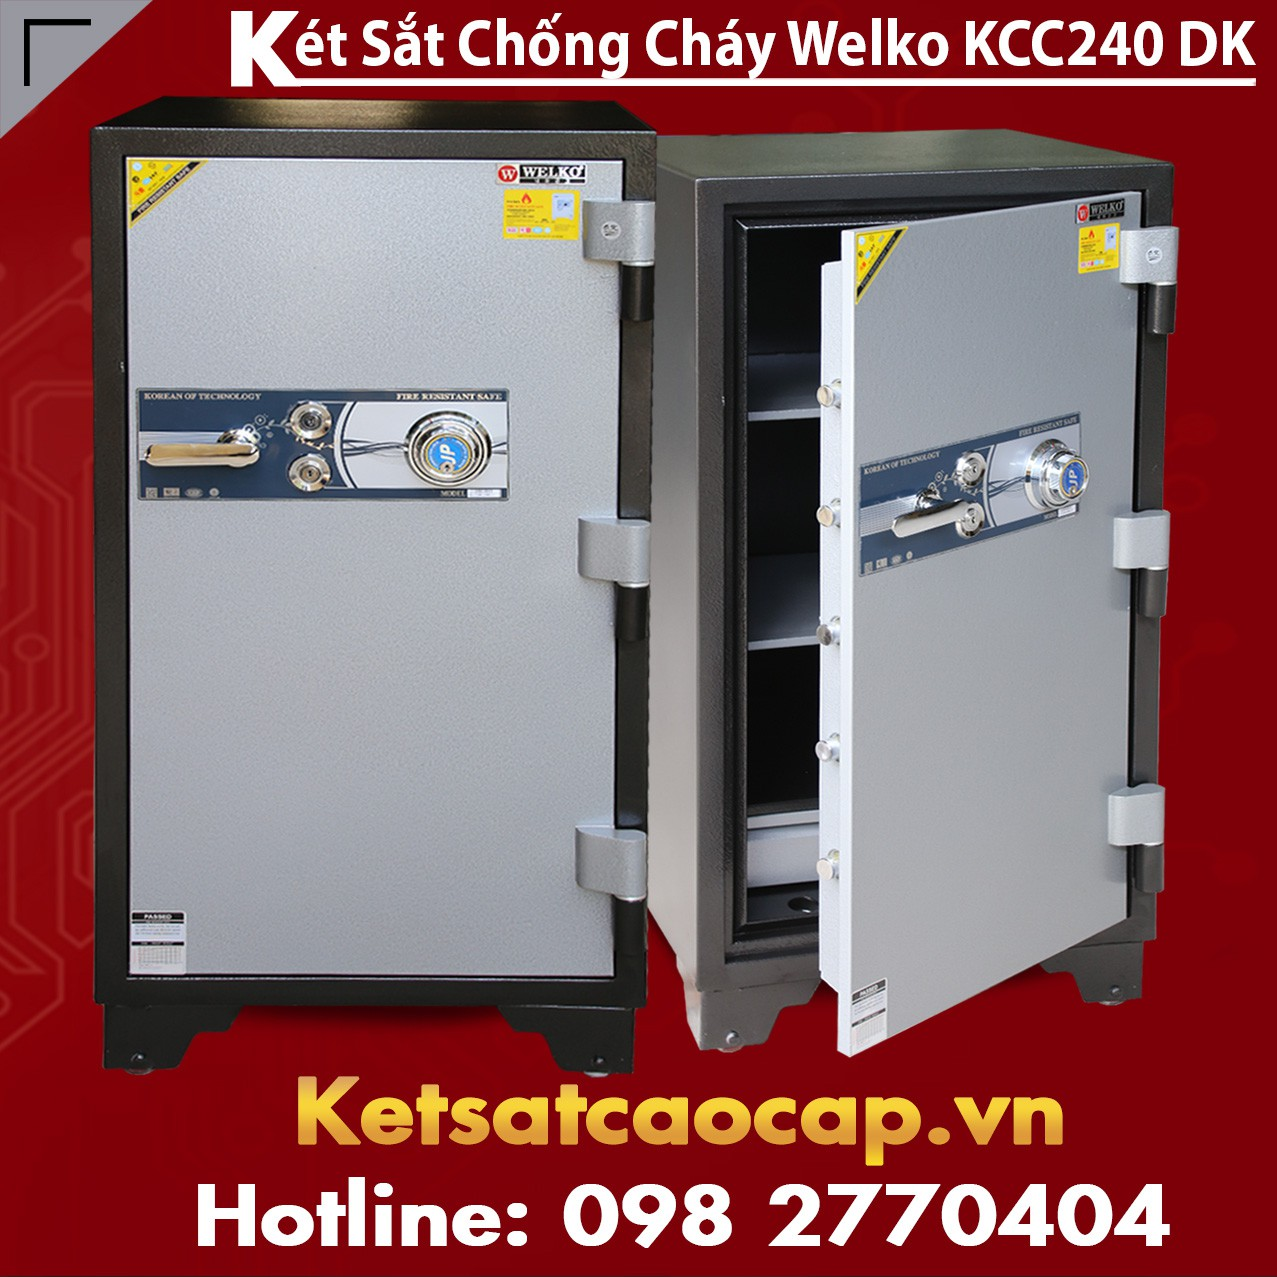 két sắt điện tử bemc KCC200 FE bắc ninh